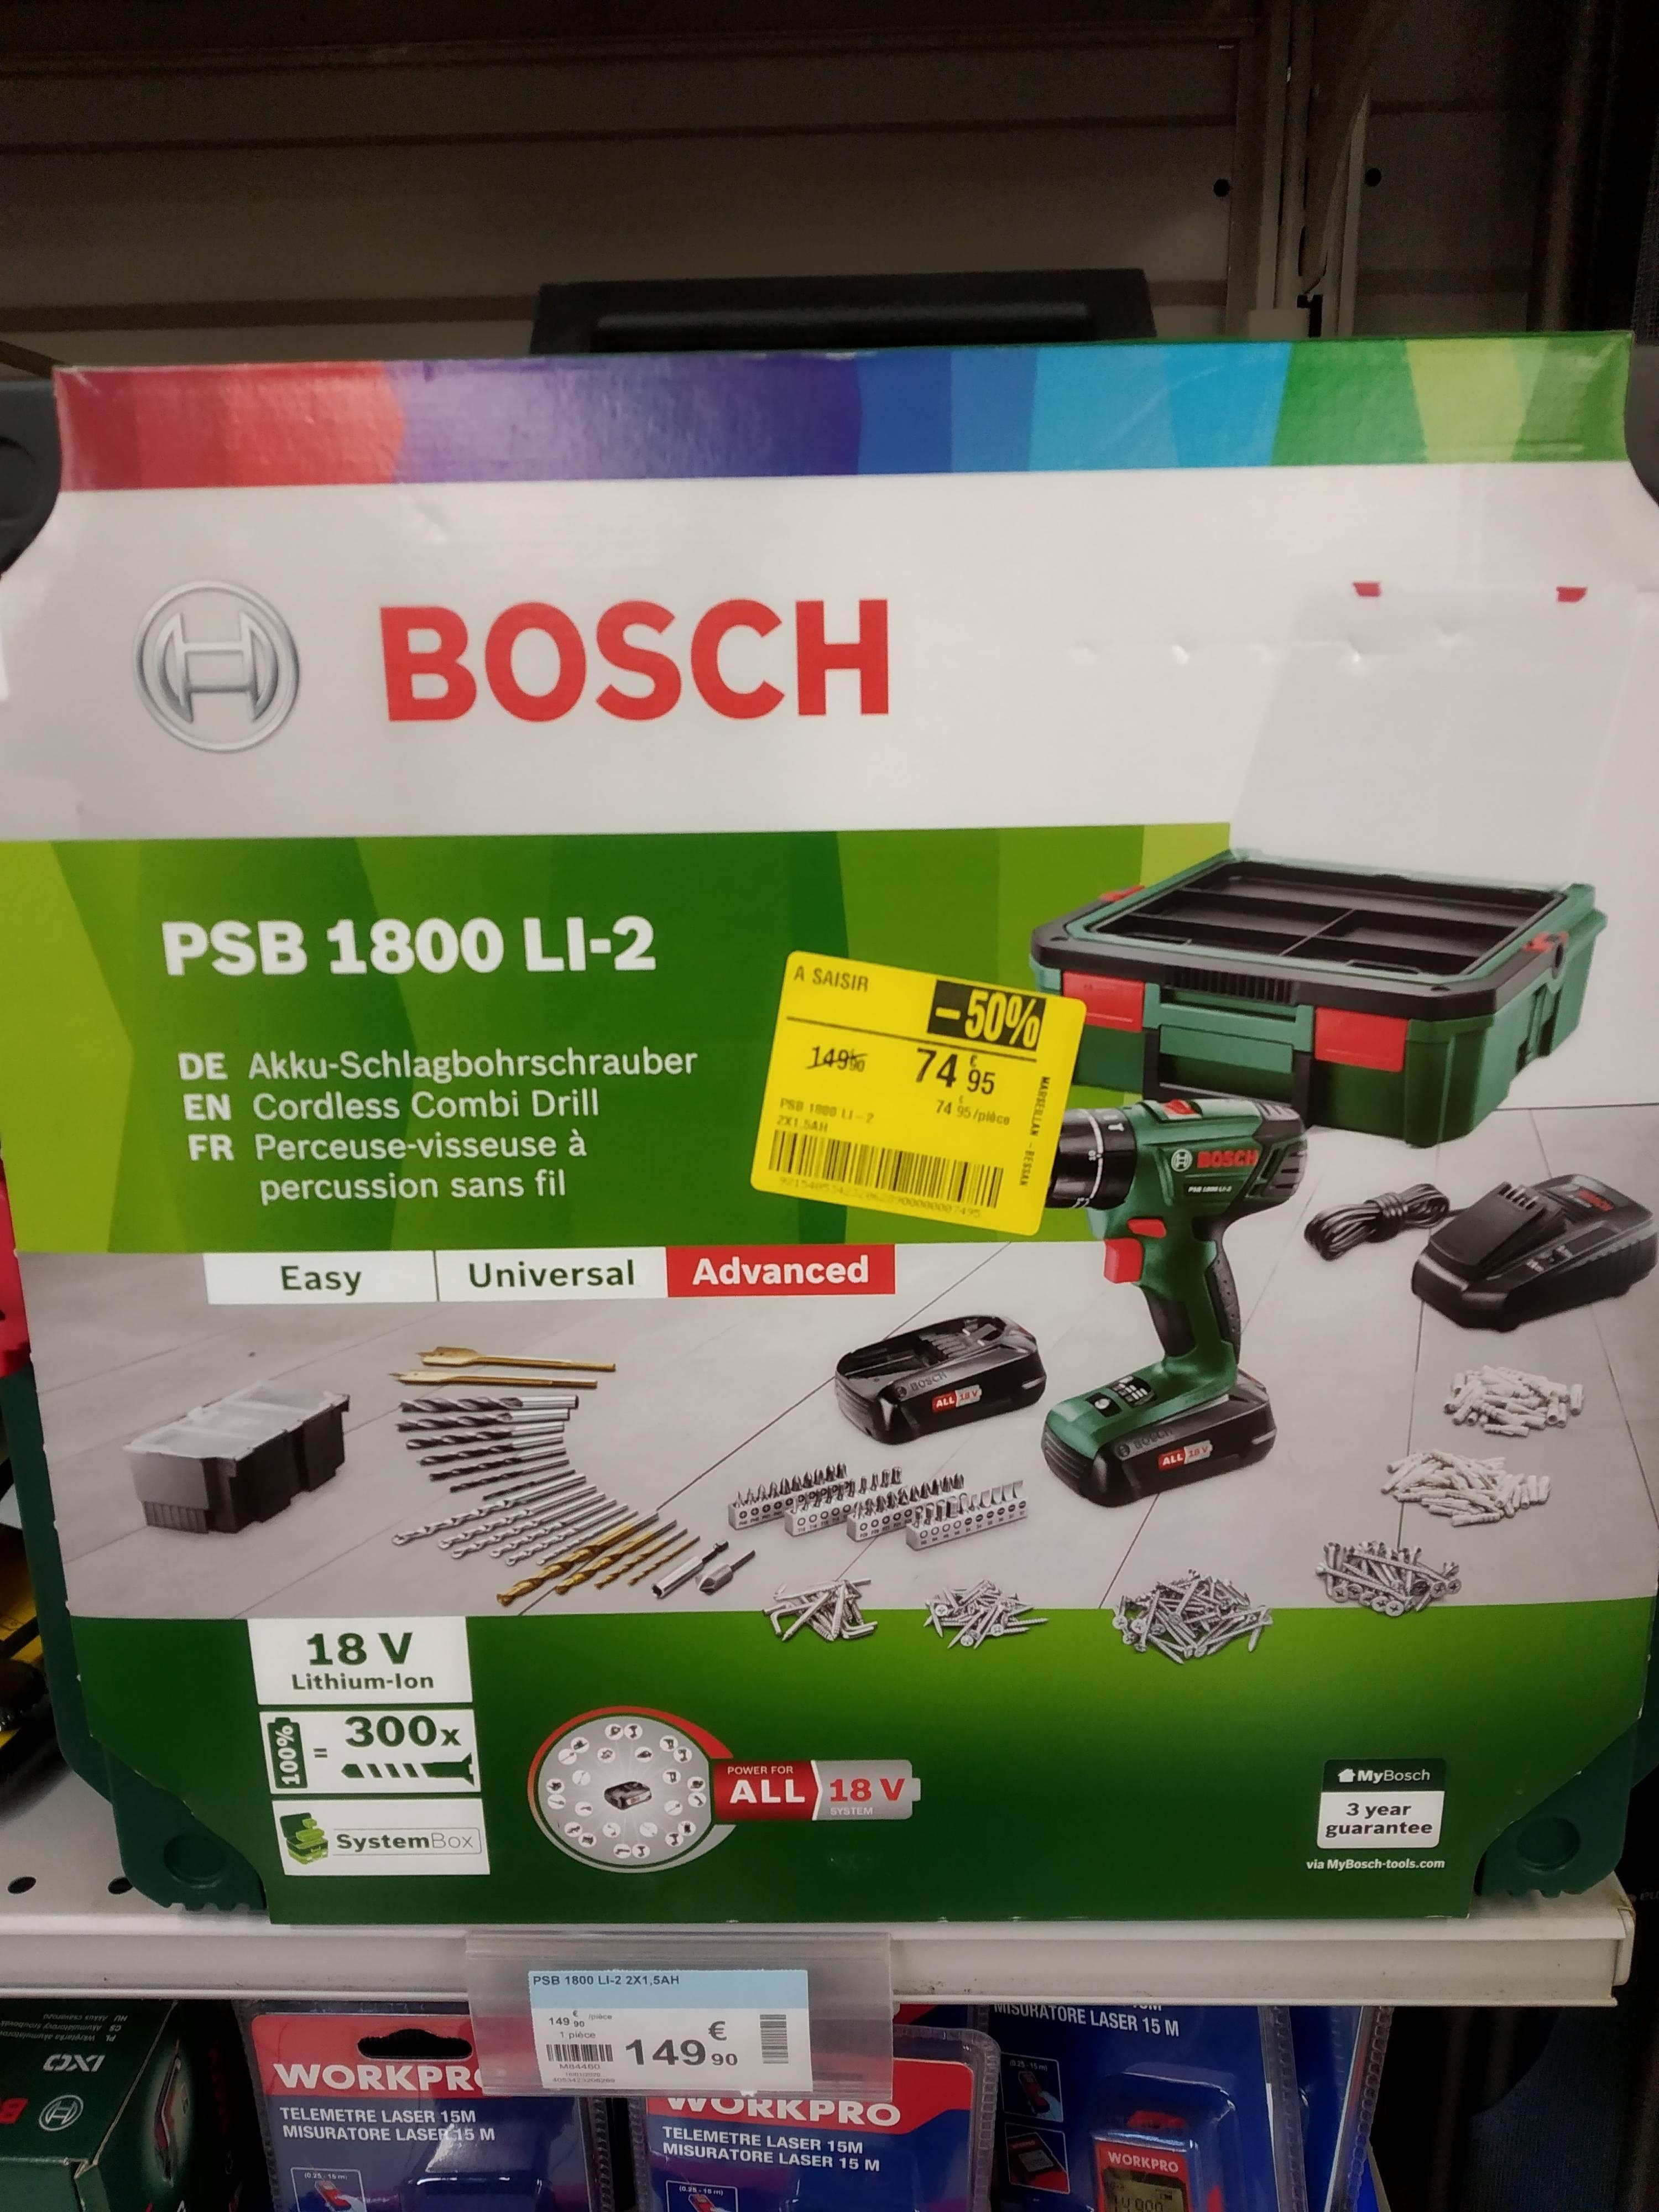 Perceuse-visseuse à percussion Bosch PSB 1800 LI-2 18 V + 2 batteries Lithium-Ion 1.5 Ah + SystemBox + 241 accessoires - Marseillan (34)